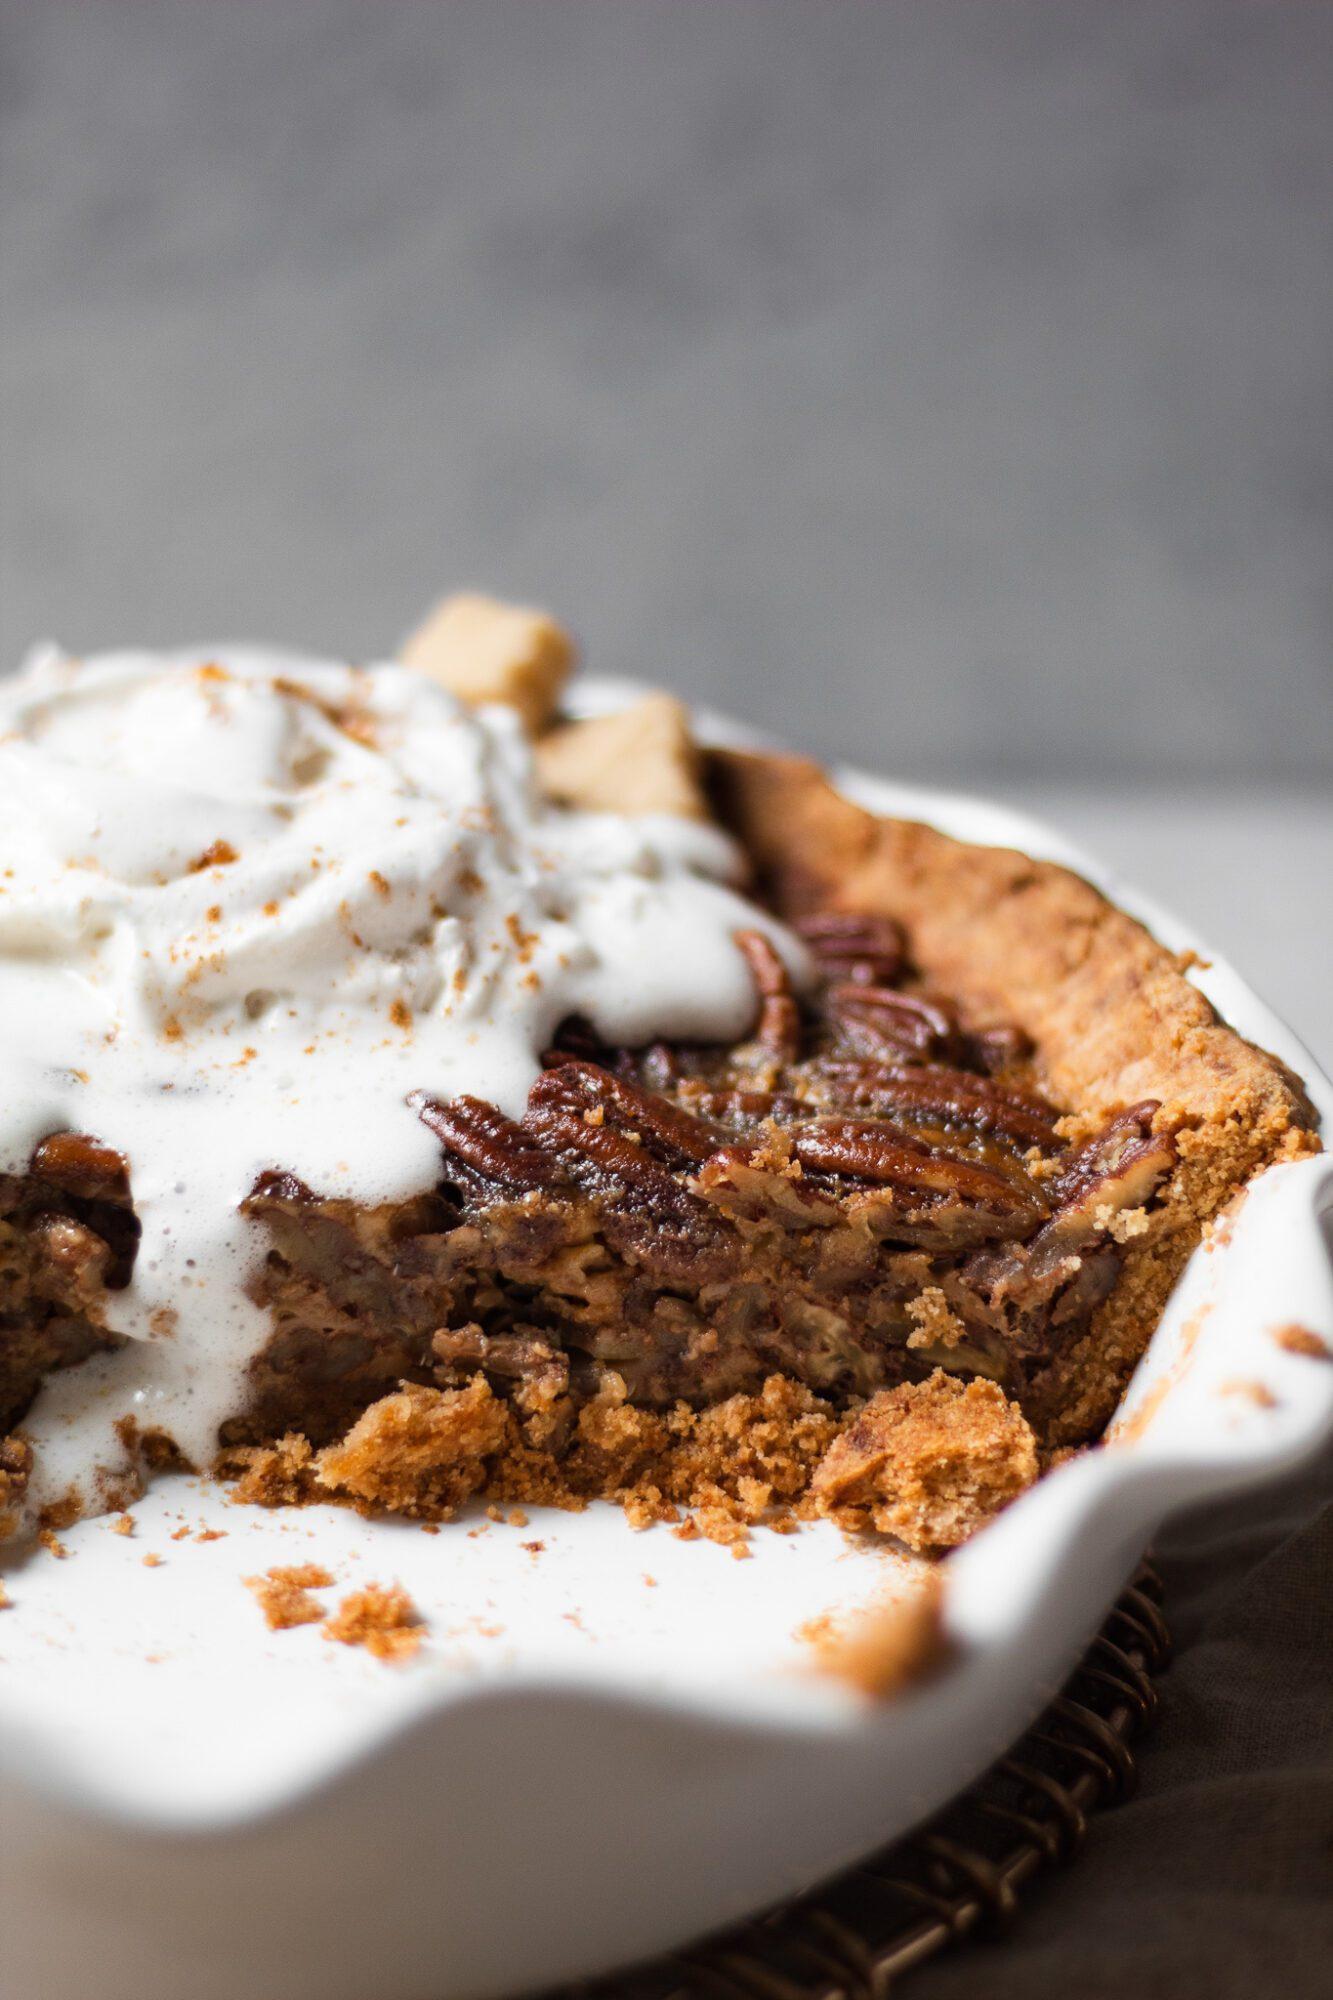 baked paleo pecan pie filling